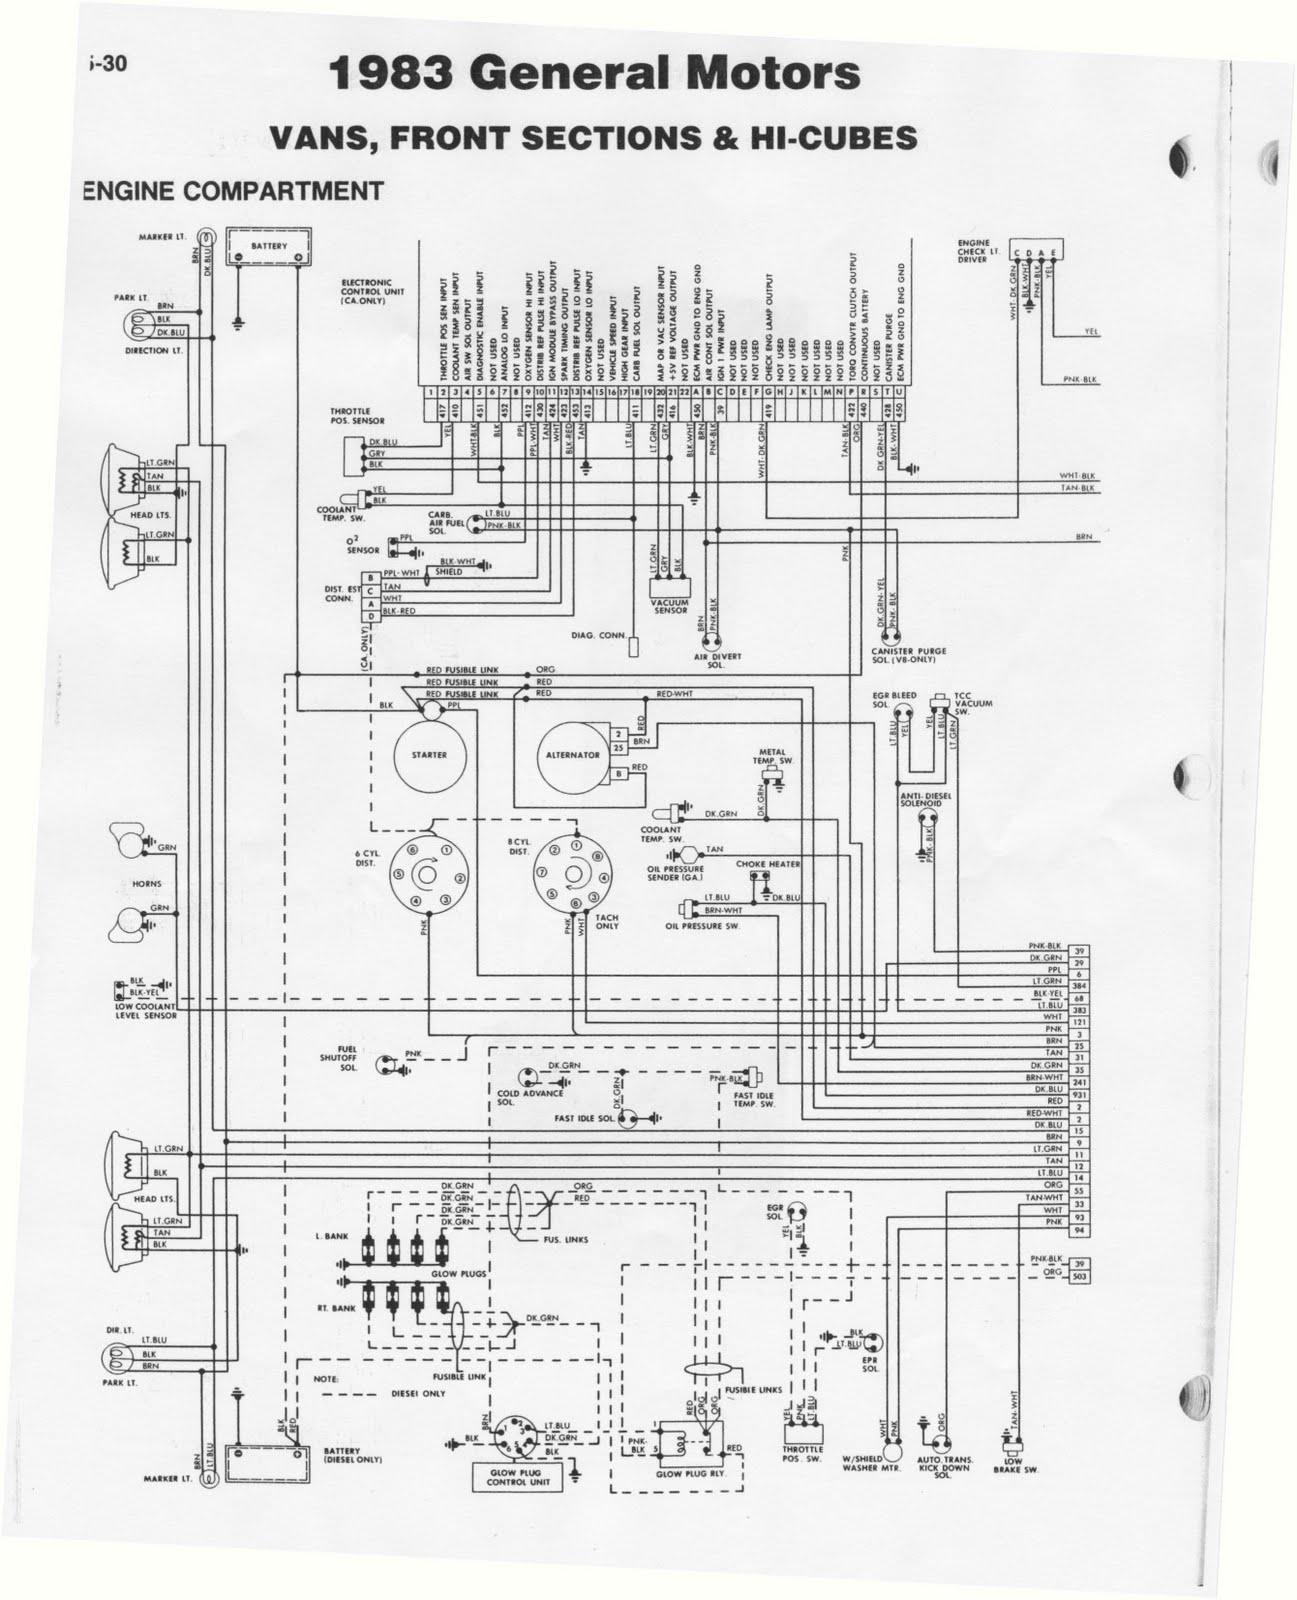 Fleetwood Wiring Diagram Motorhome : fleetwood, wiring, diagram, motorhome, Arrow, Fleetwood, Wiring, Diagram, Options, -Indexes, Fusebox.nescafe.jeanjaures37.fr